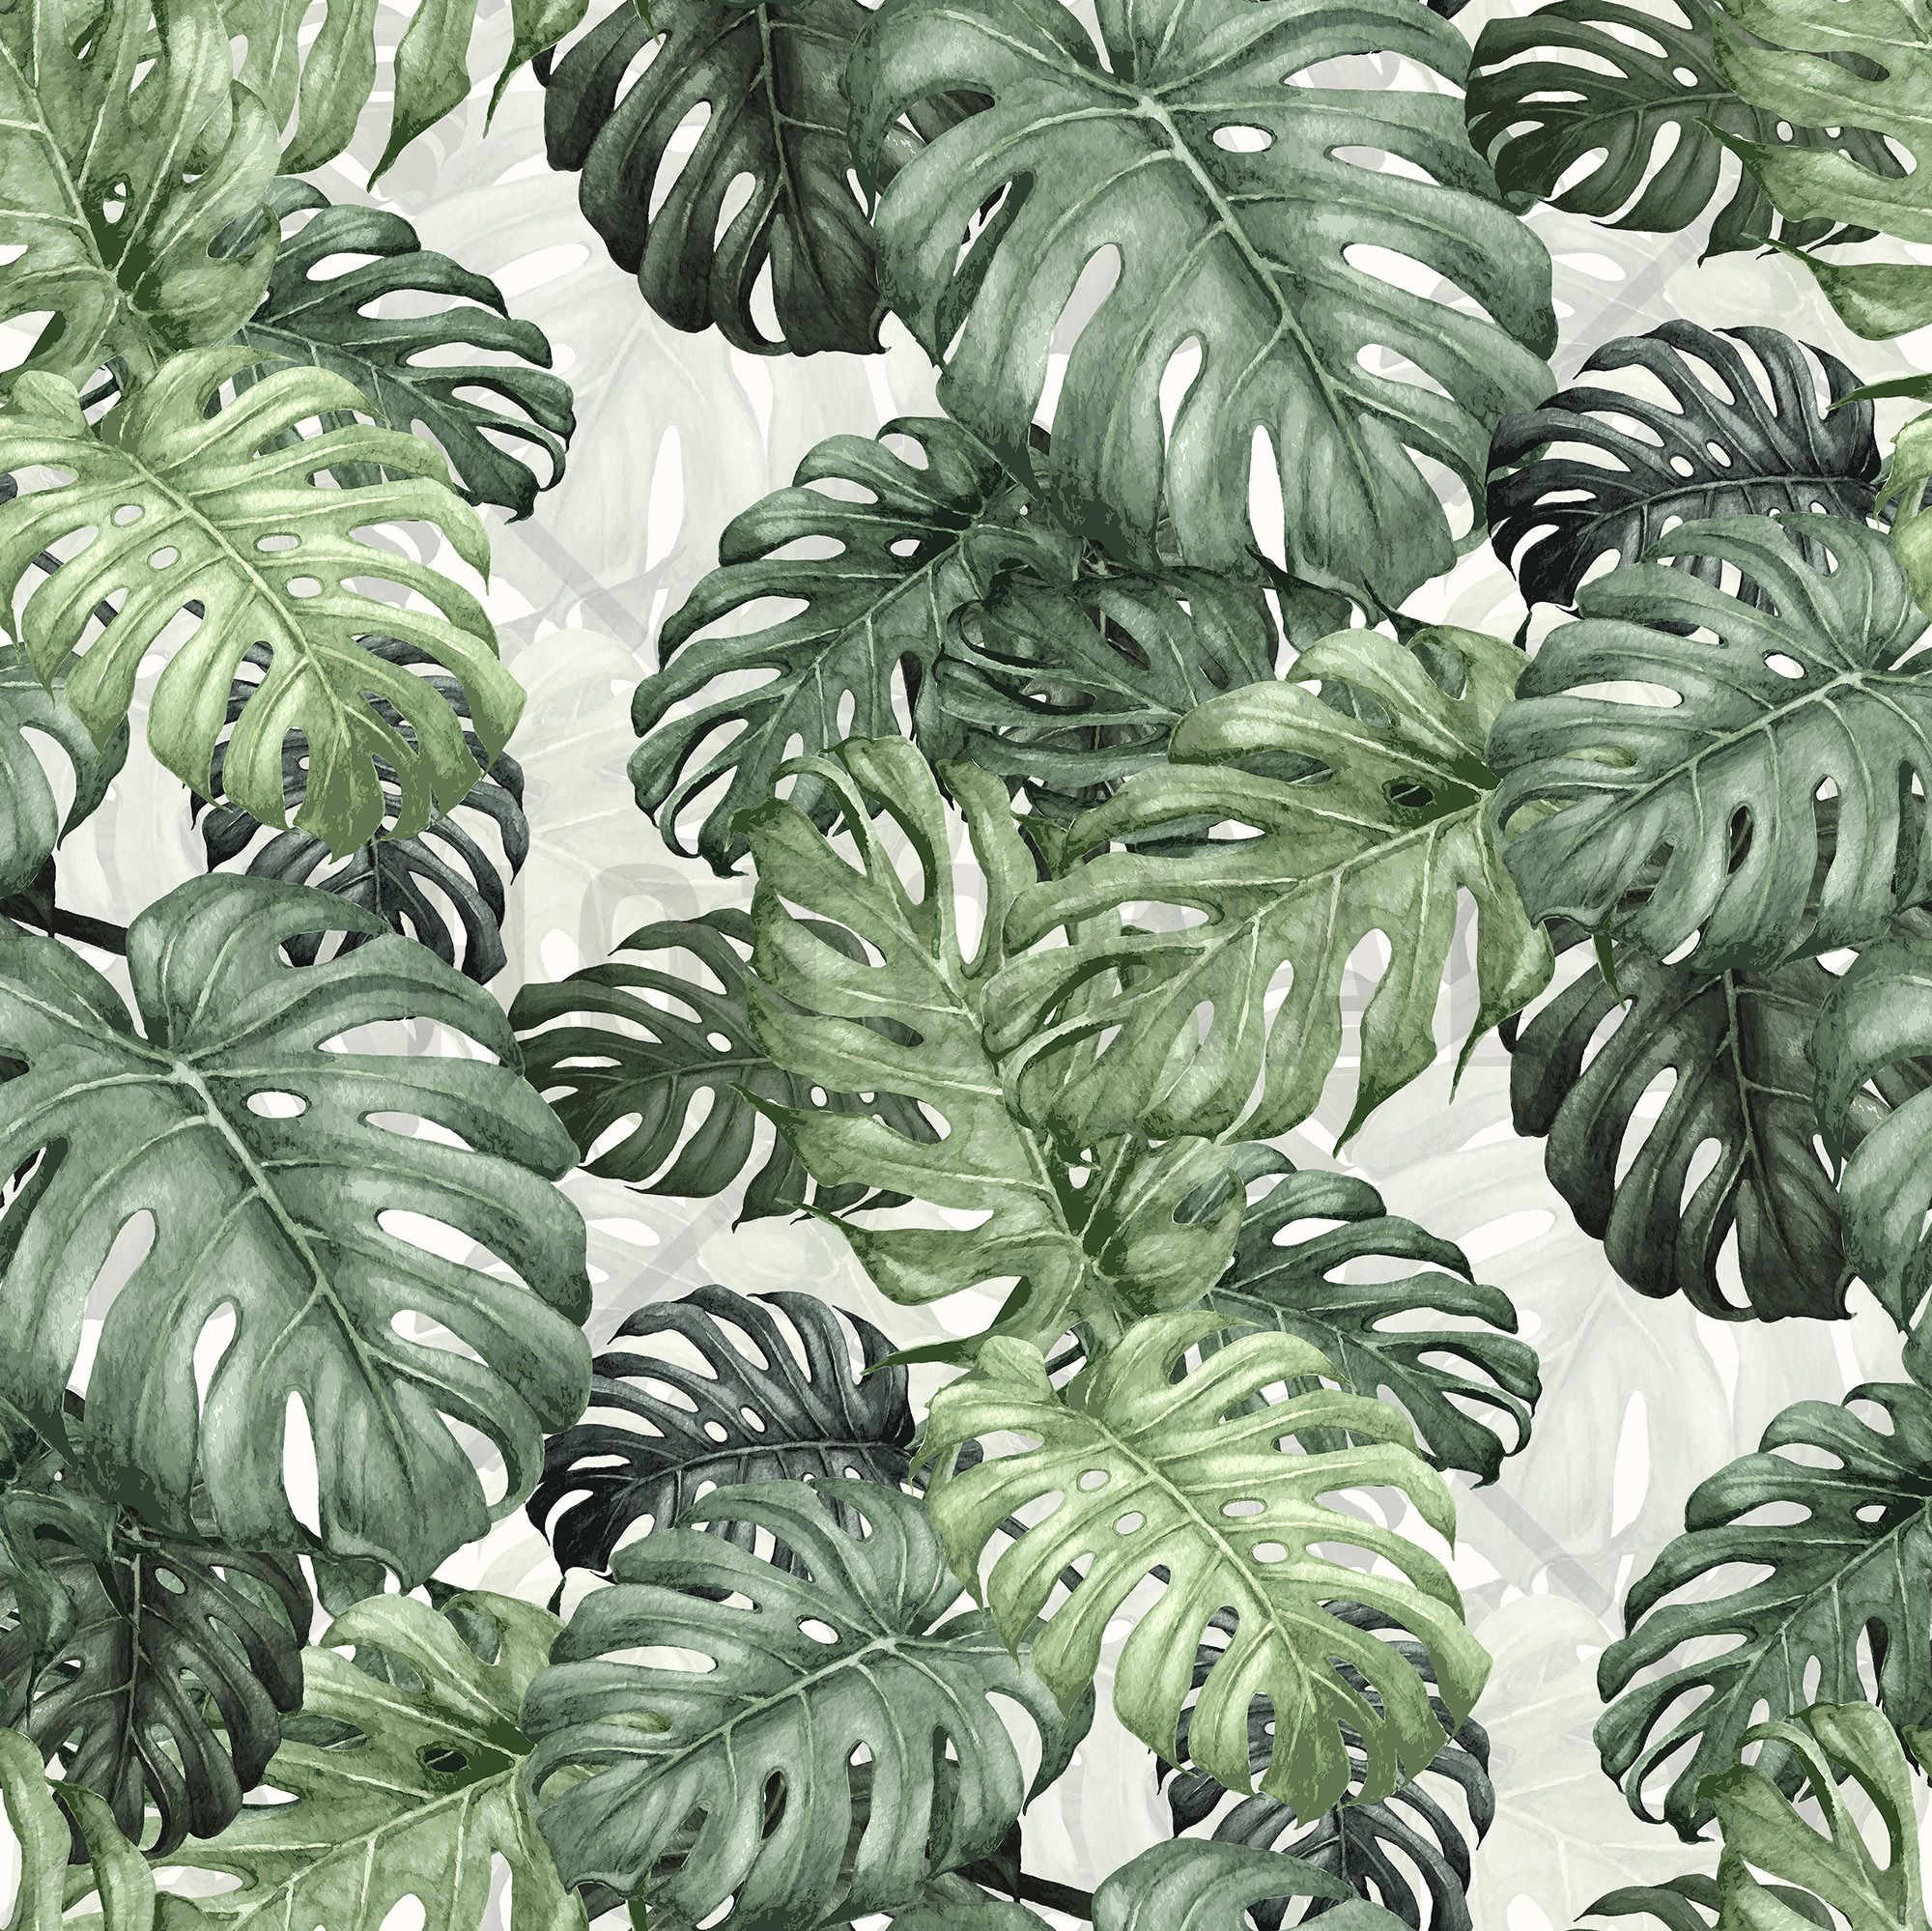 botany monstera mural de pared y papel tapiz fotogr fico photowall manisb2000. Black Bedroom Furniture Sets. Home Design Ideas